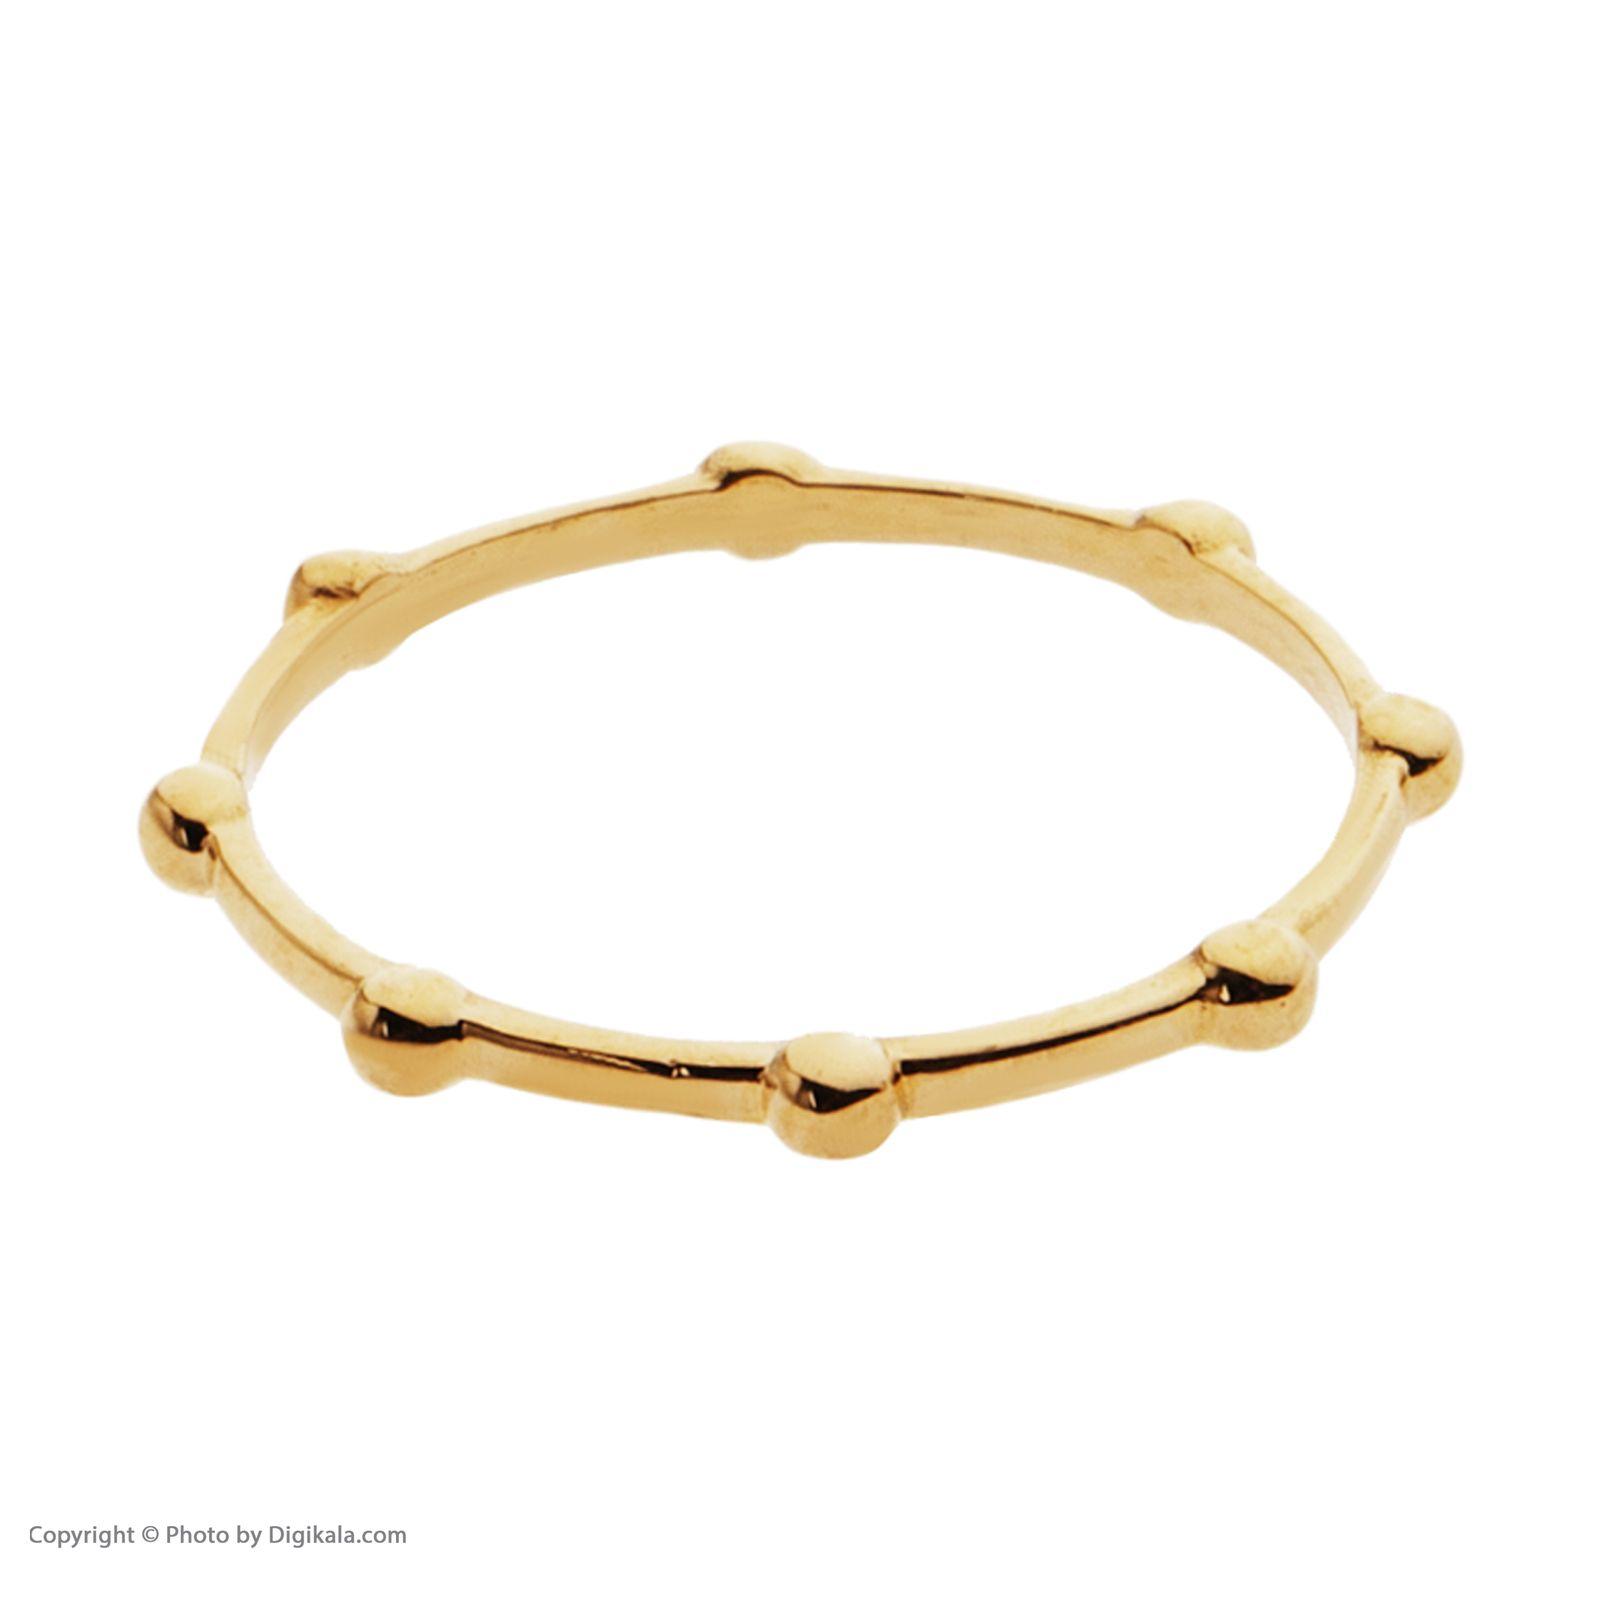 انگشتر طلا 18 عیار زنانه سنجاق مدل X090577 -  - 5